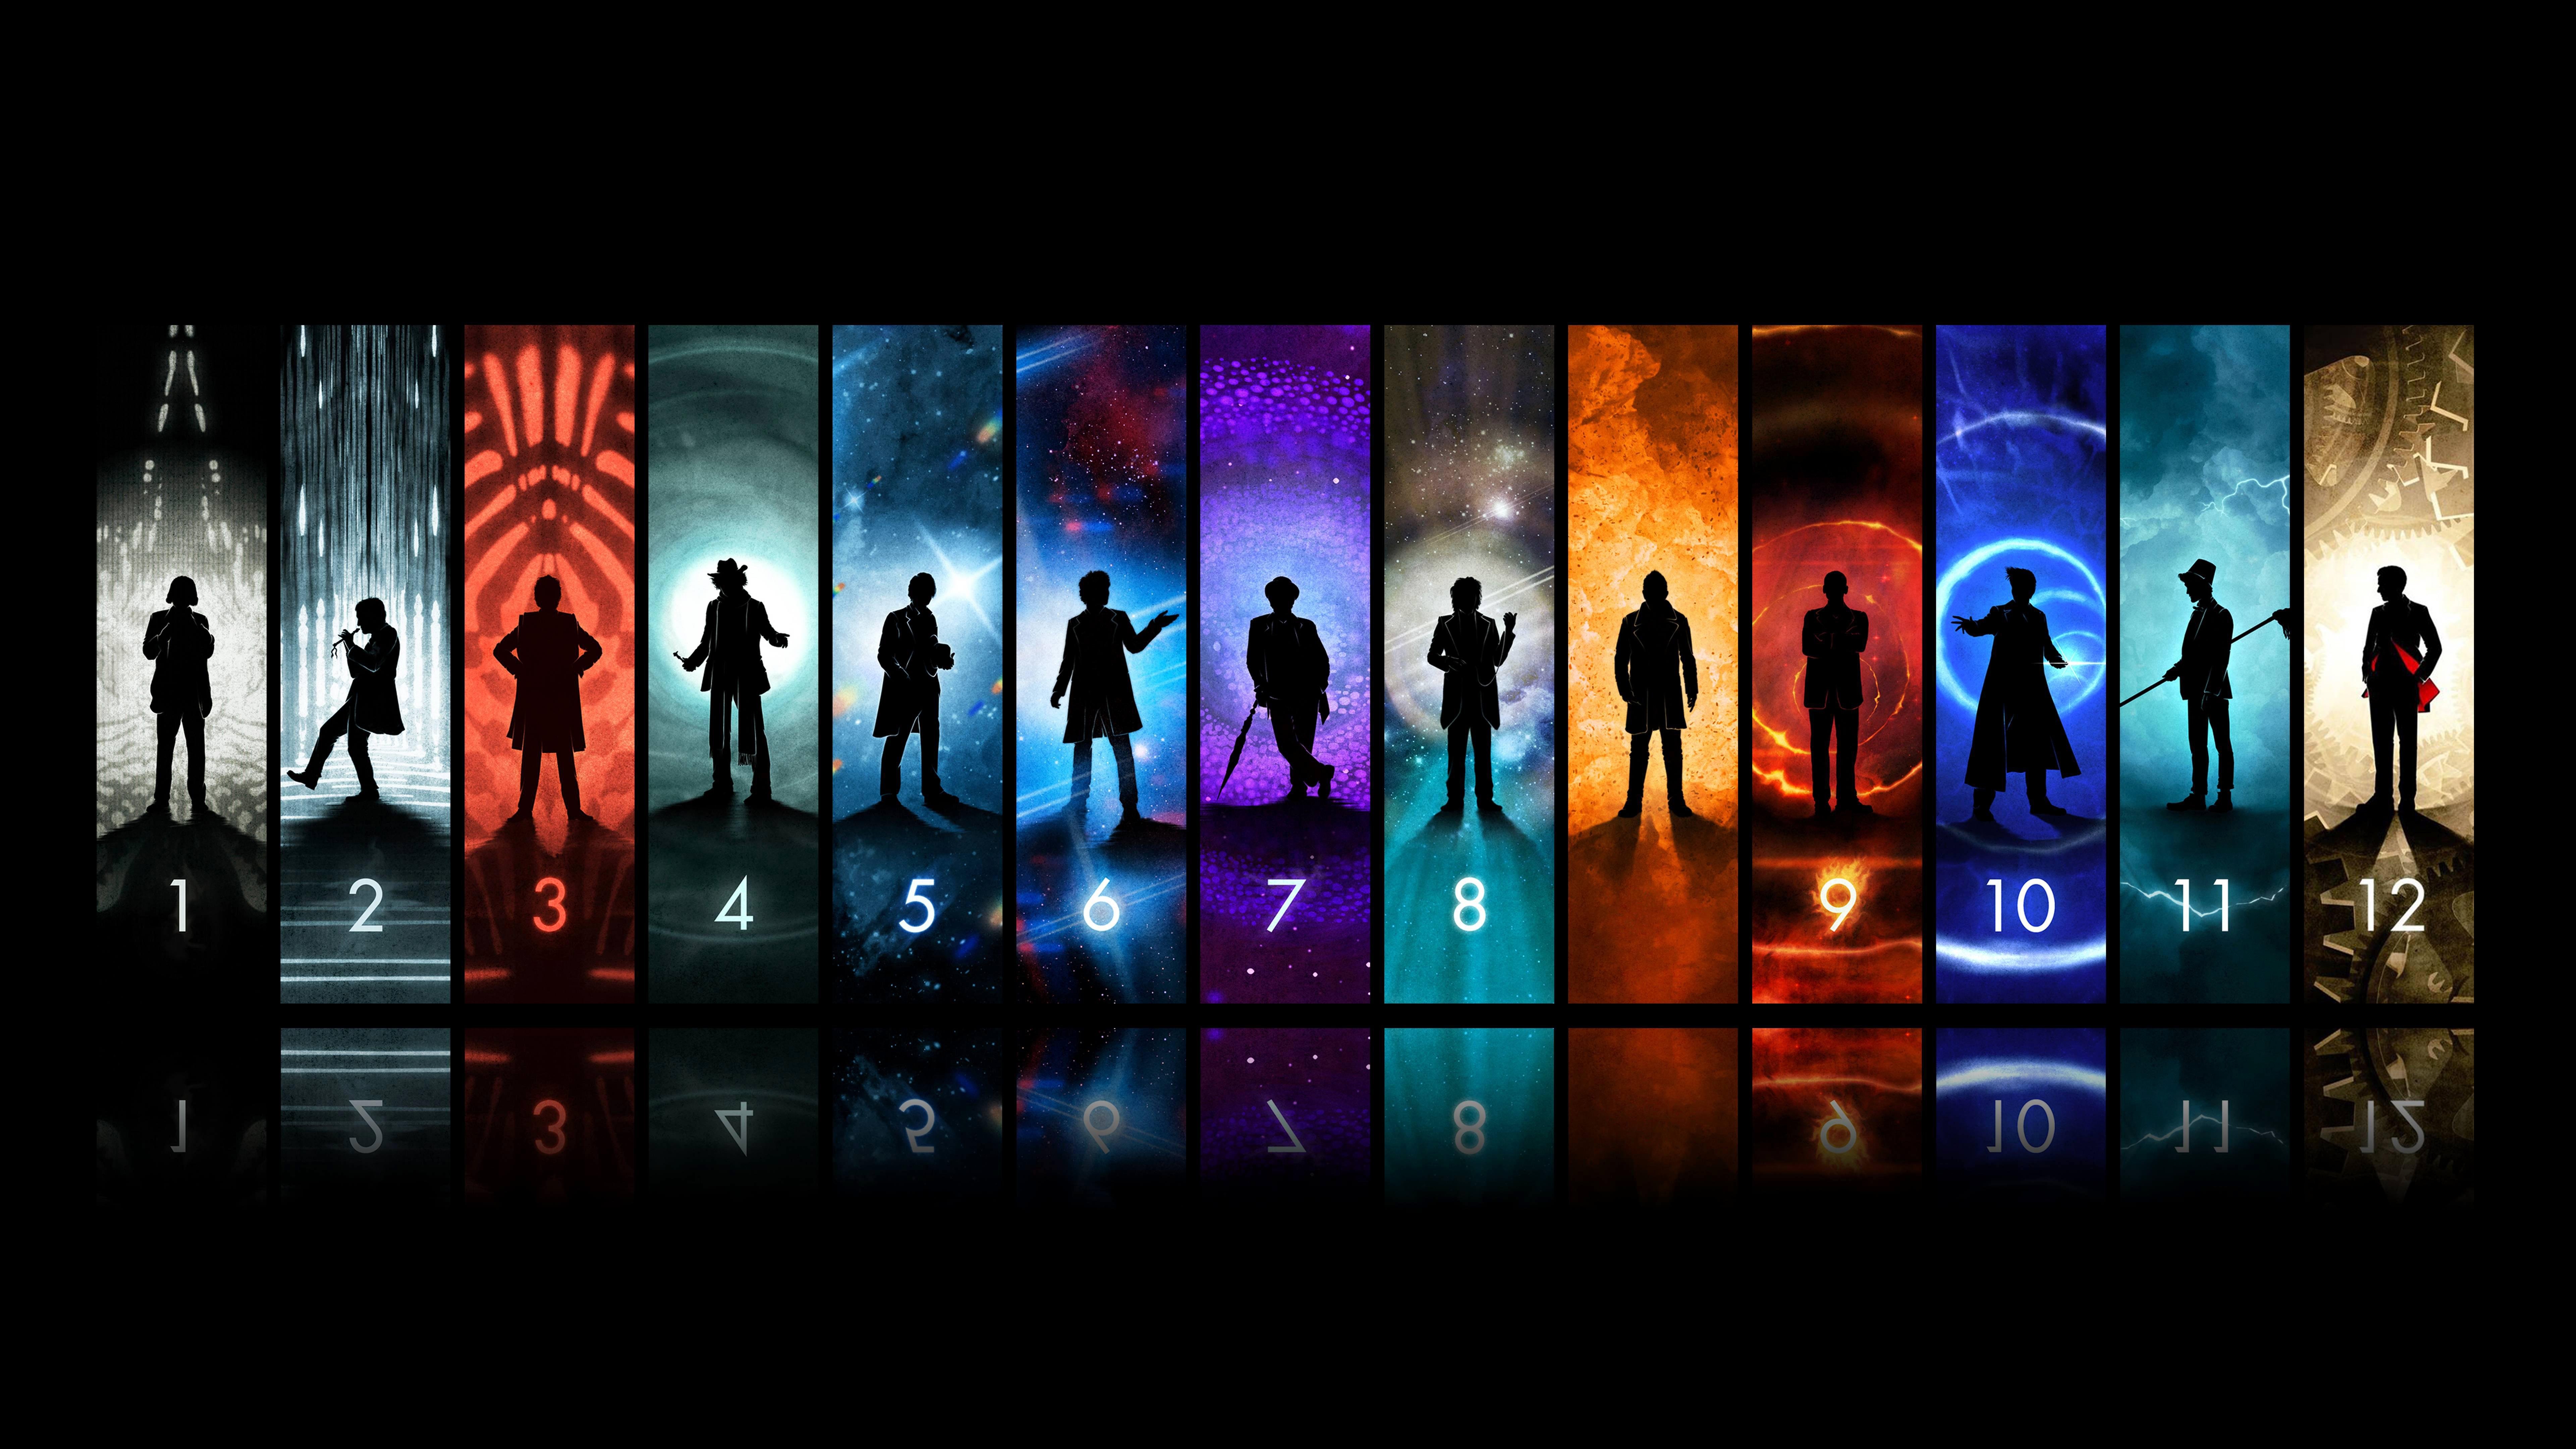 Star Trek Dual Monitor Wallpaper Posted By Samantha Mercado